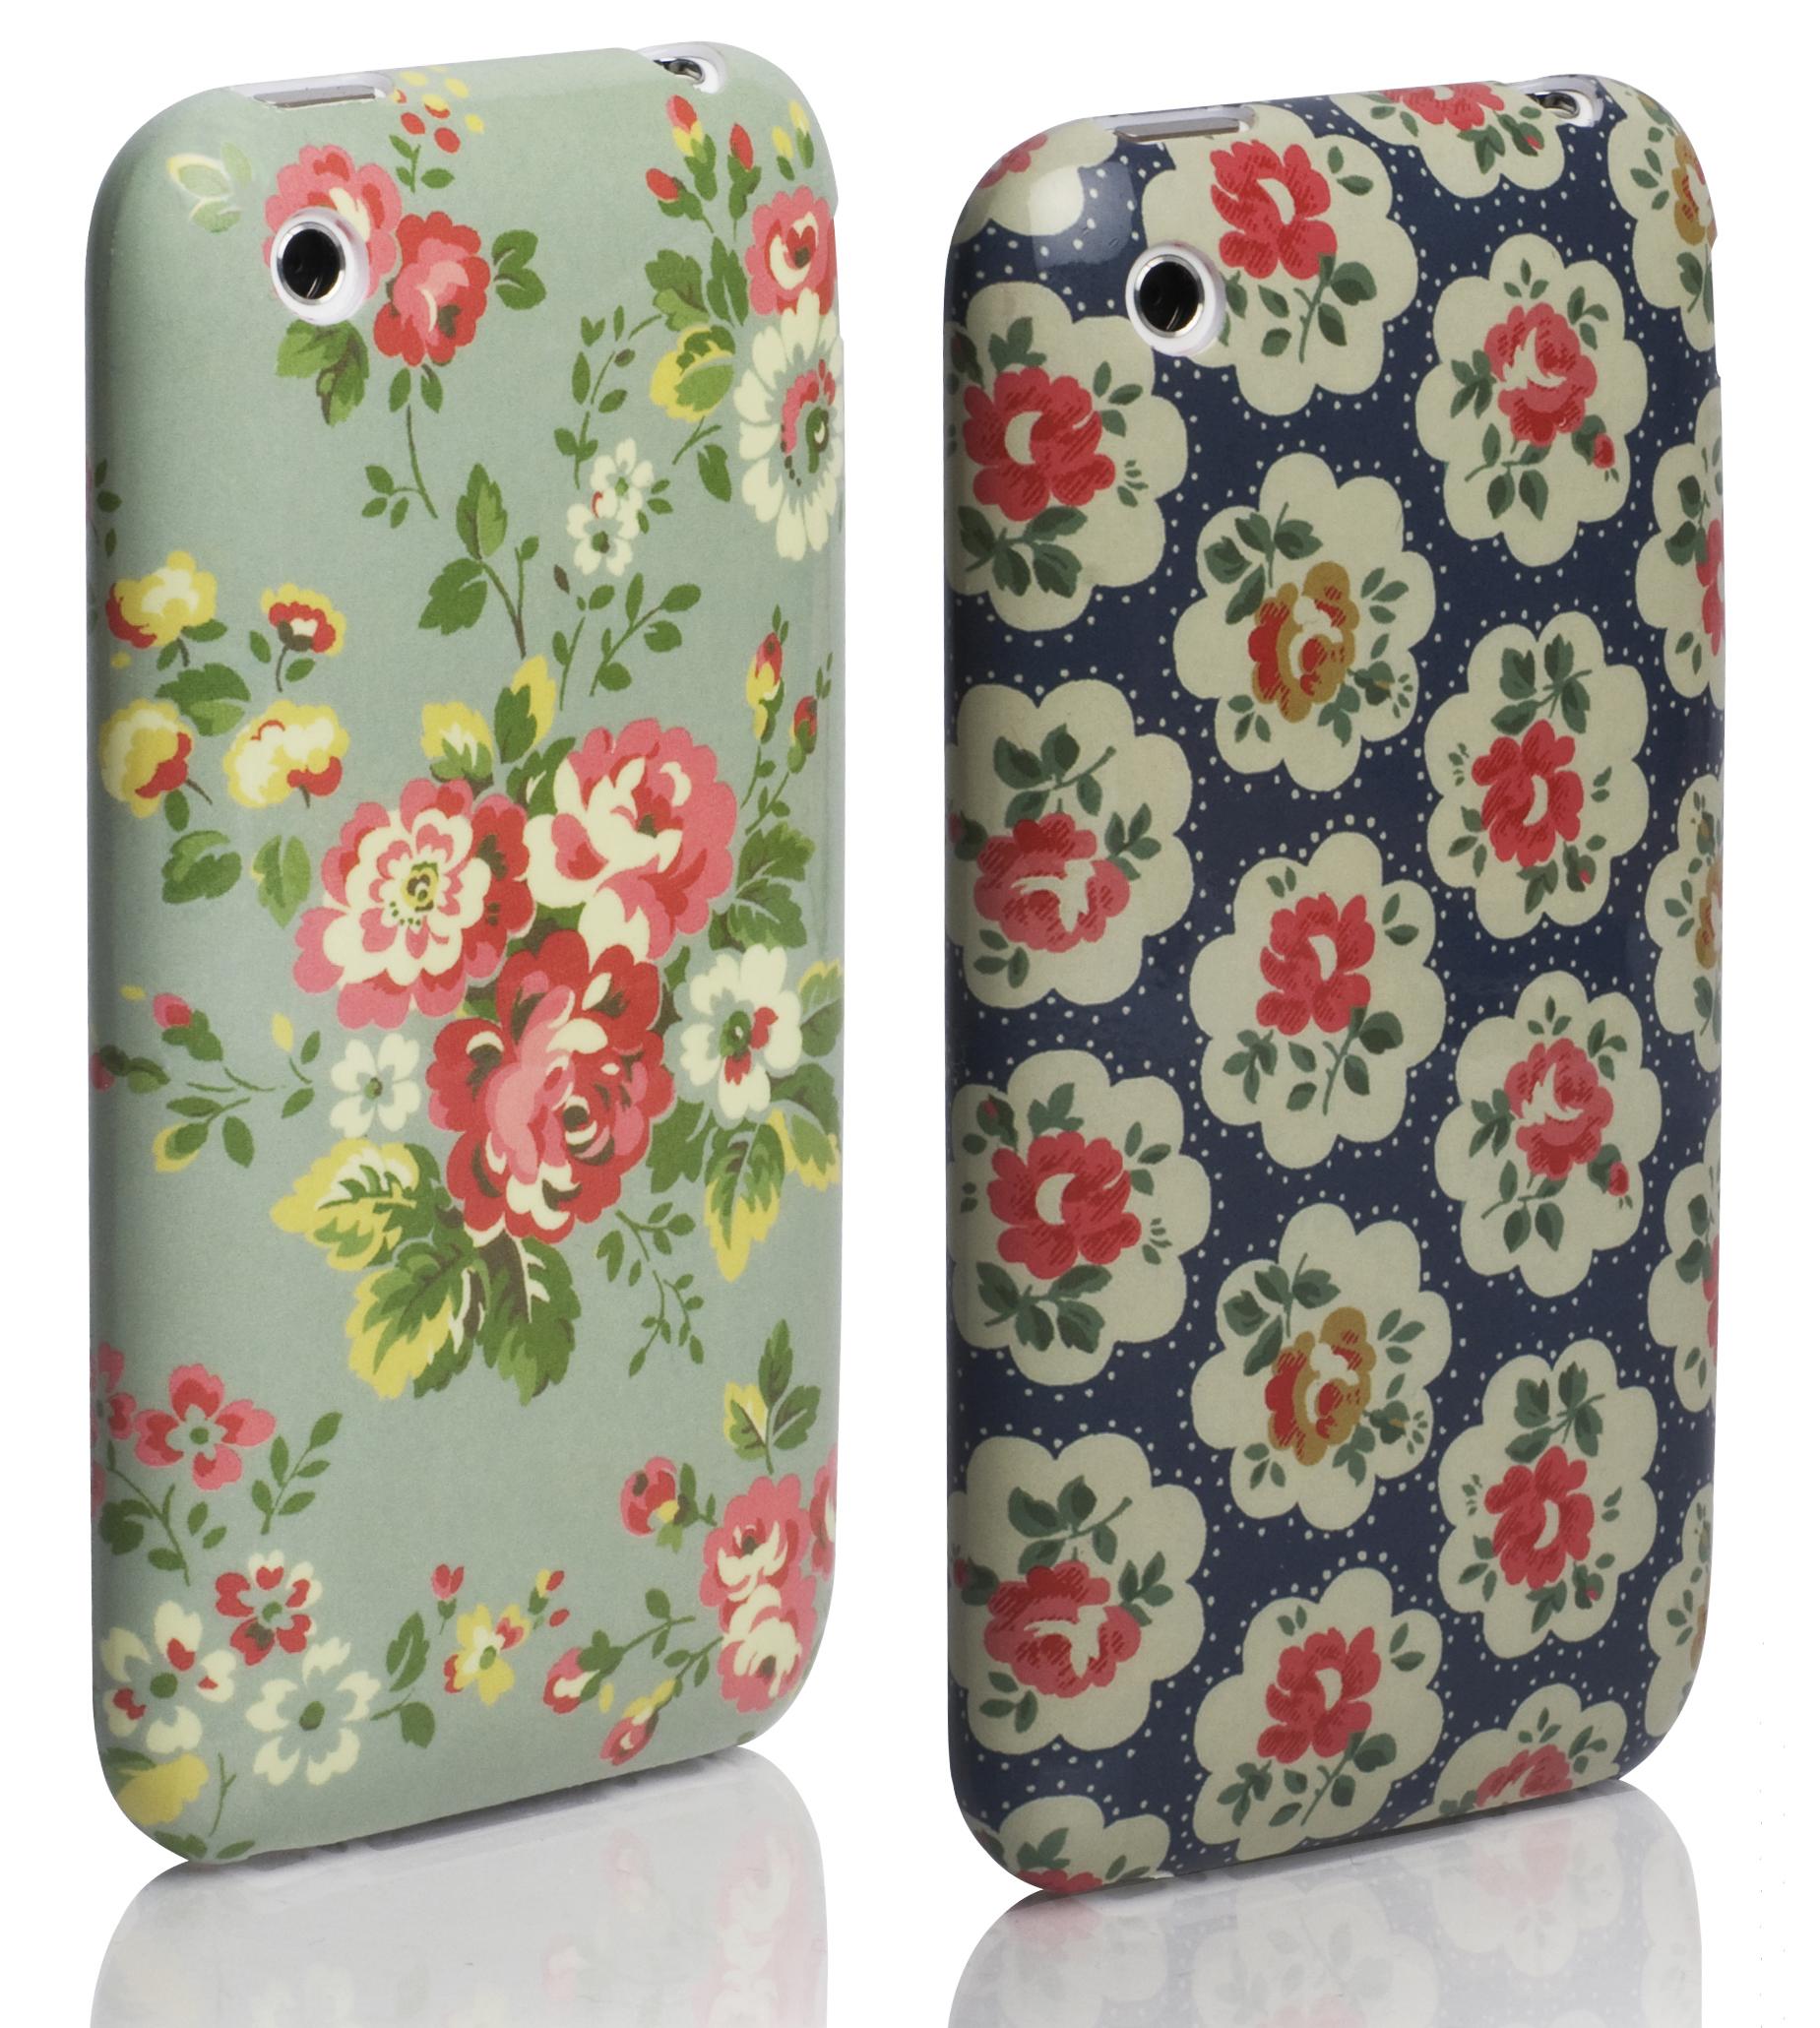 Case Design cath kidston blackberry phone case : cath kidston : seamsandstitches